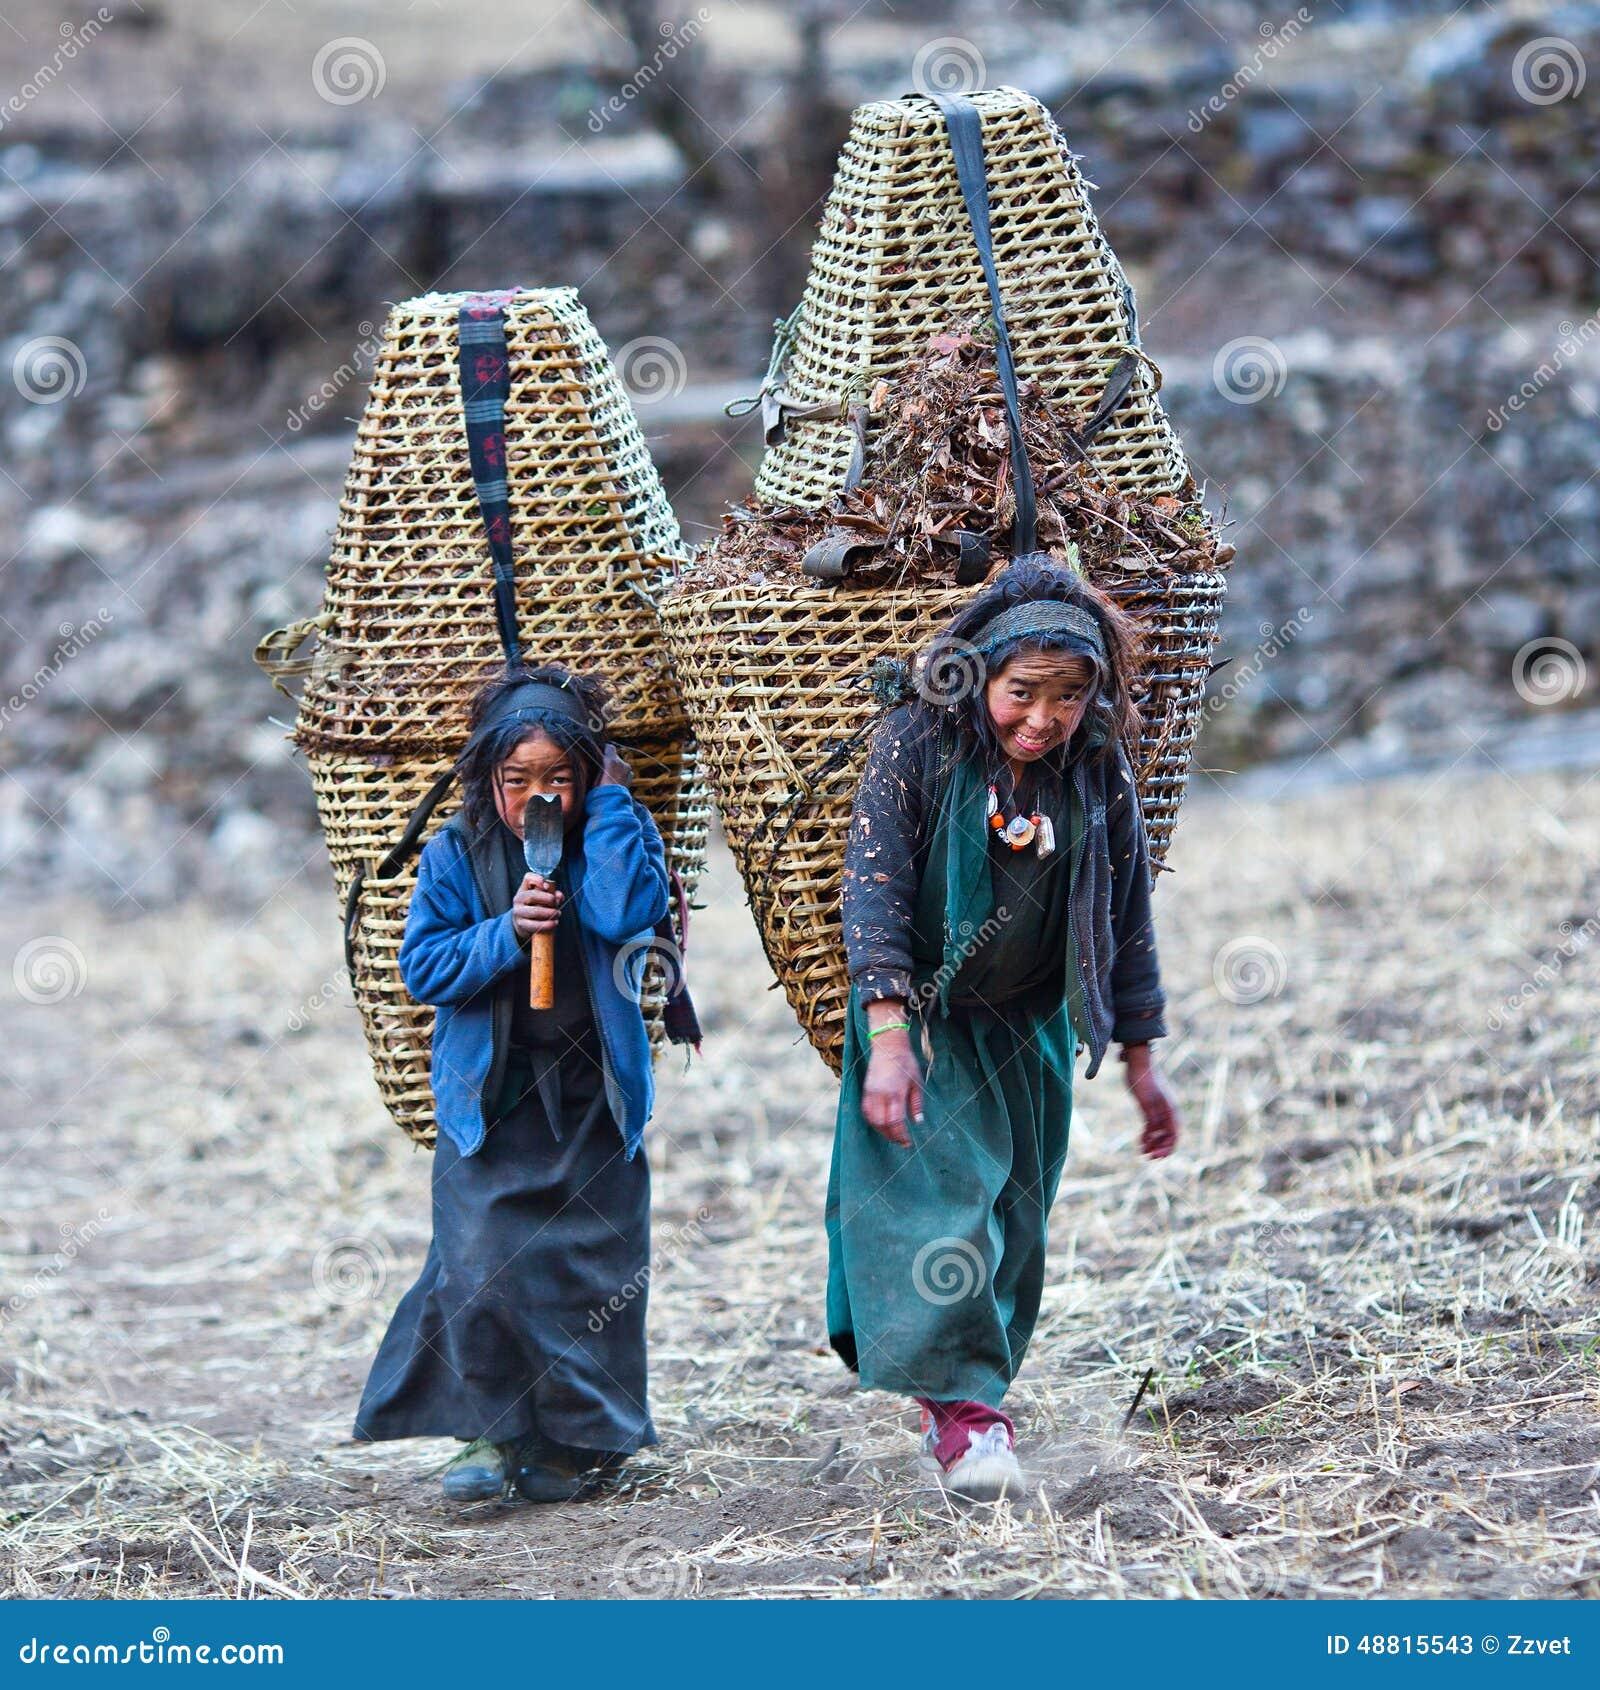 Tibetan People In Nepal Editorial Stock Photo Image Of